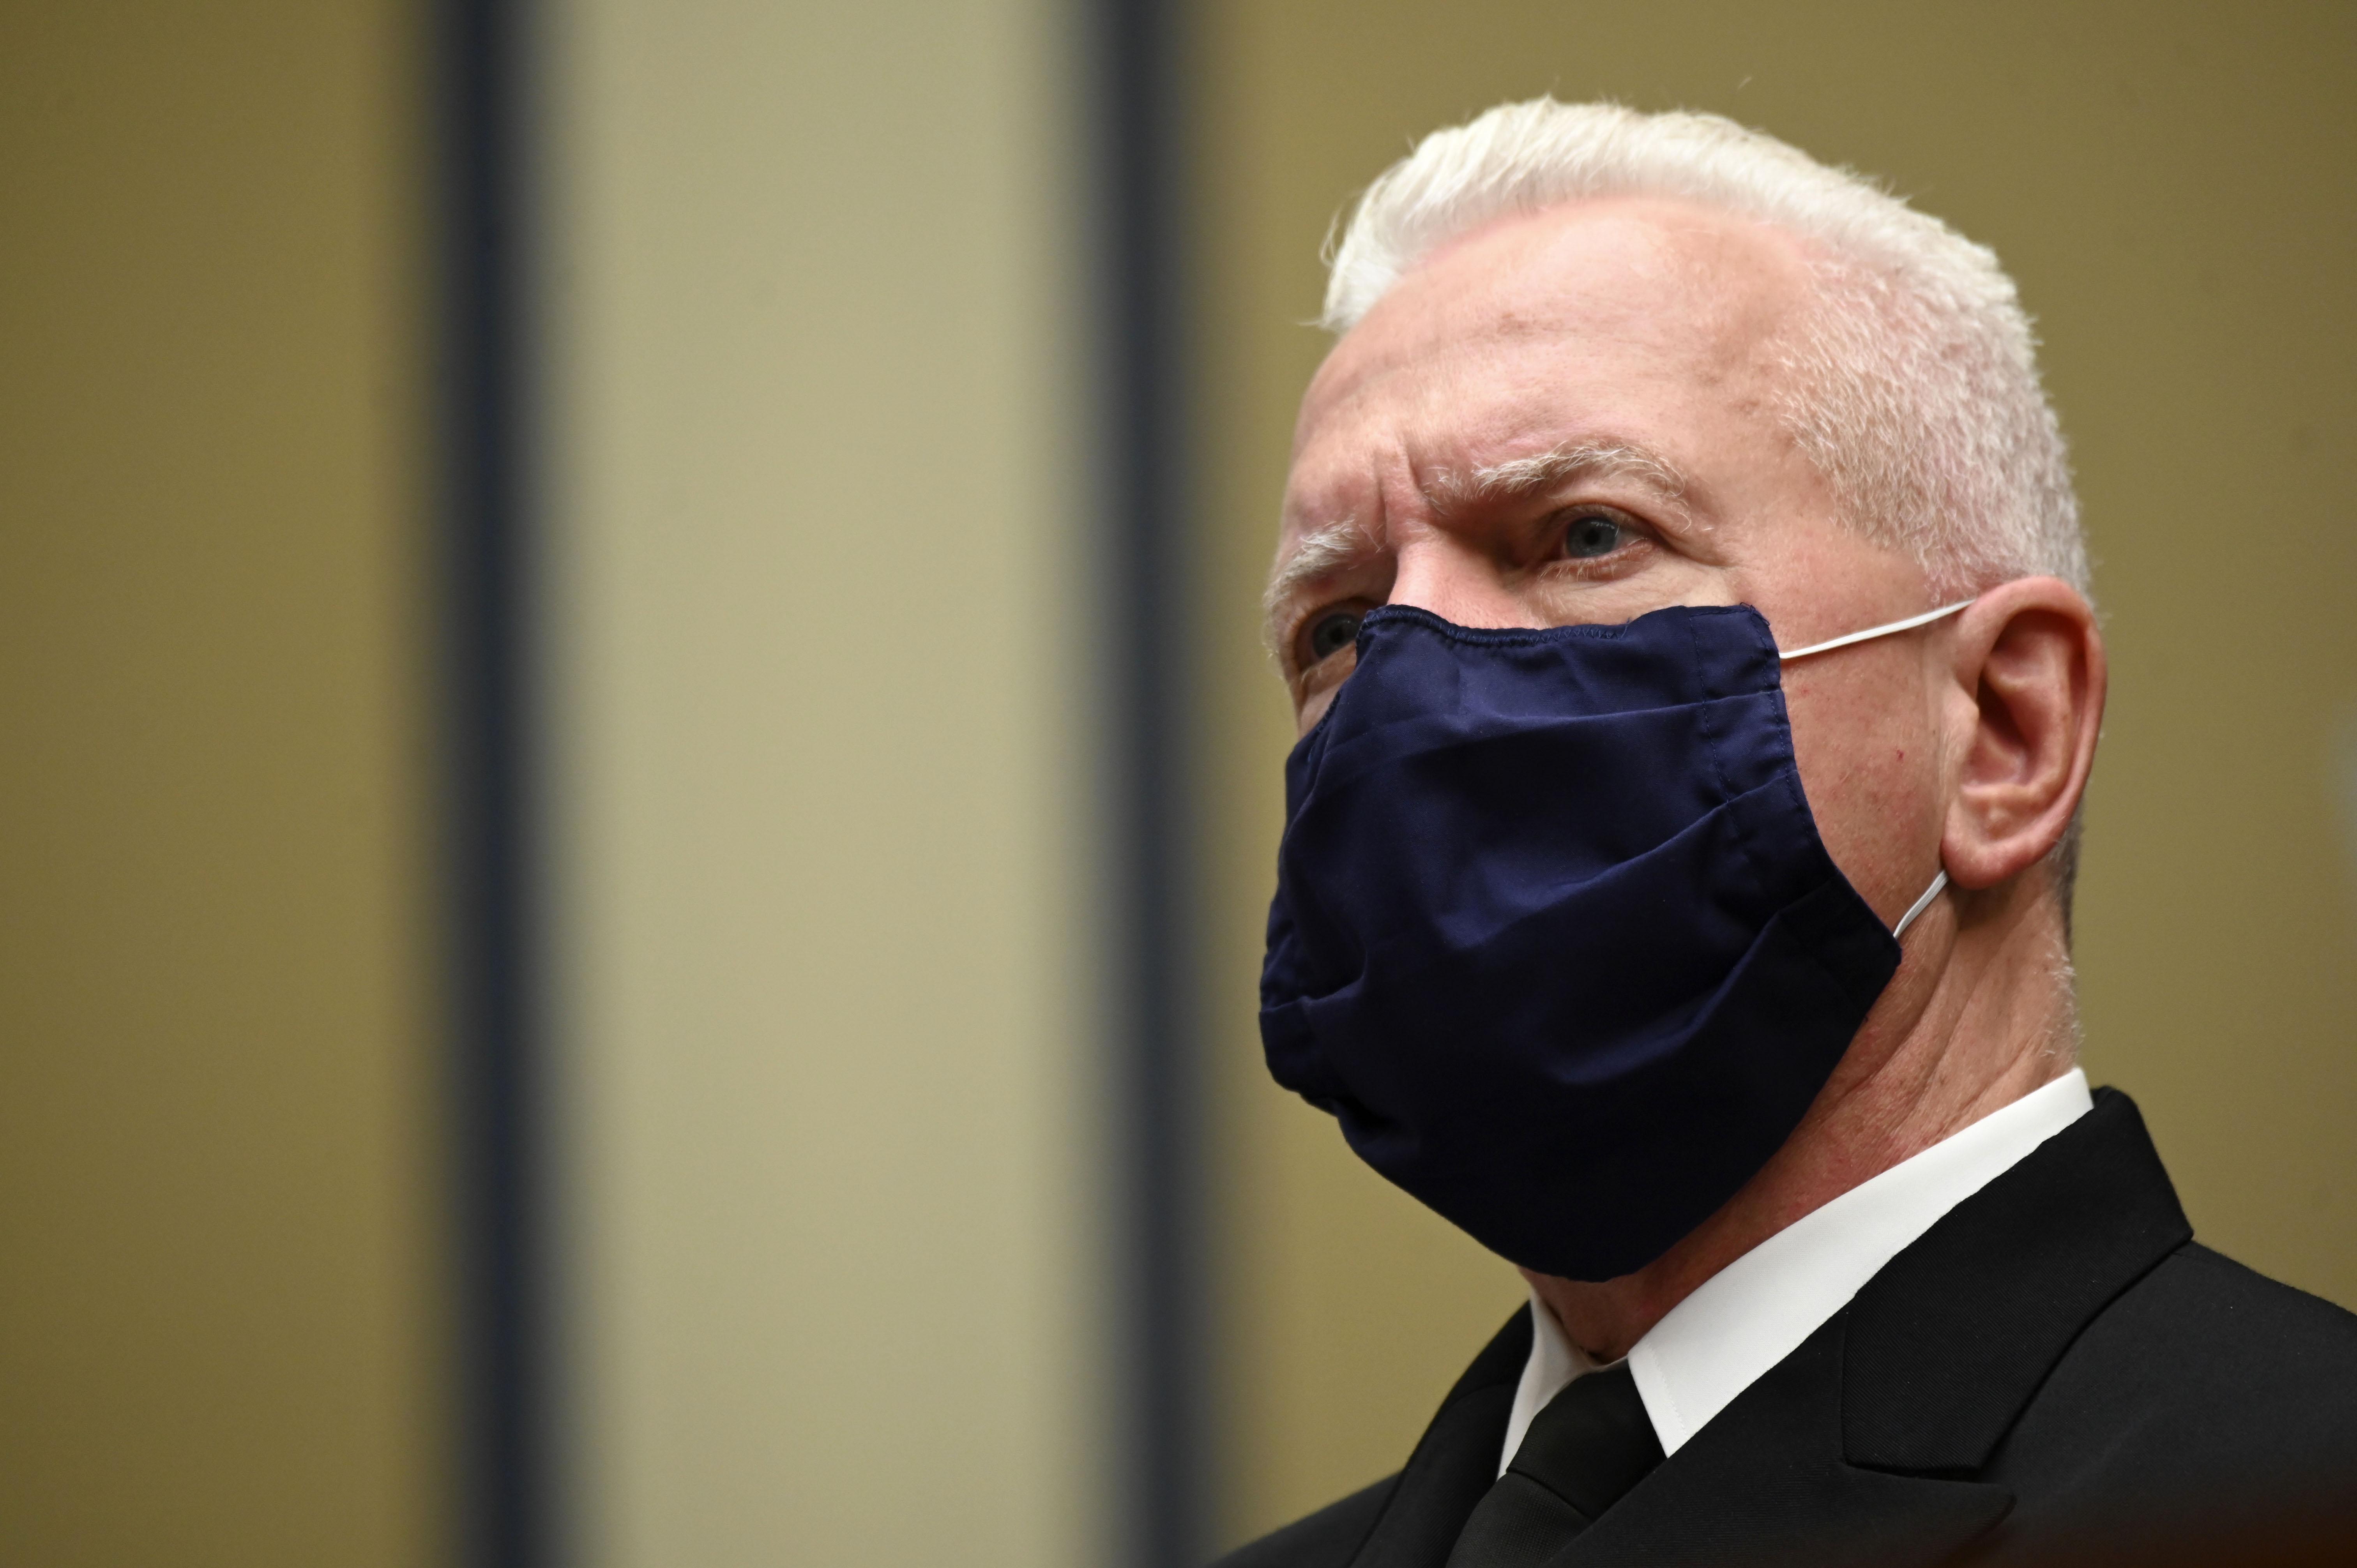 Adm. Brett Giroir attends a hearing on July 31 in Washington, DC.